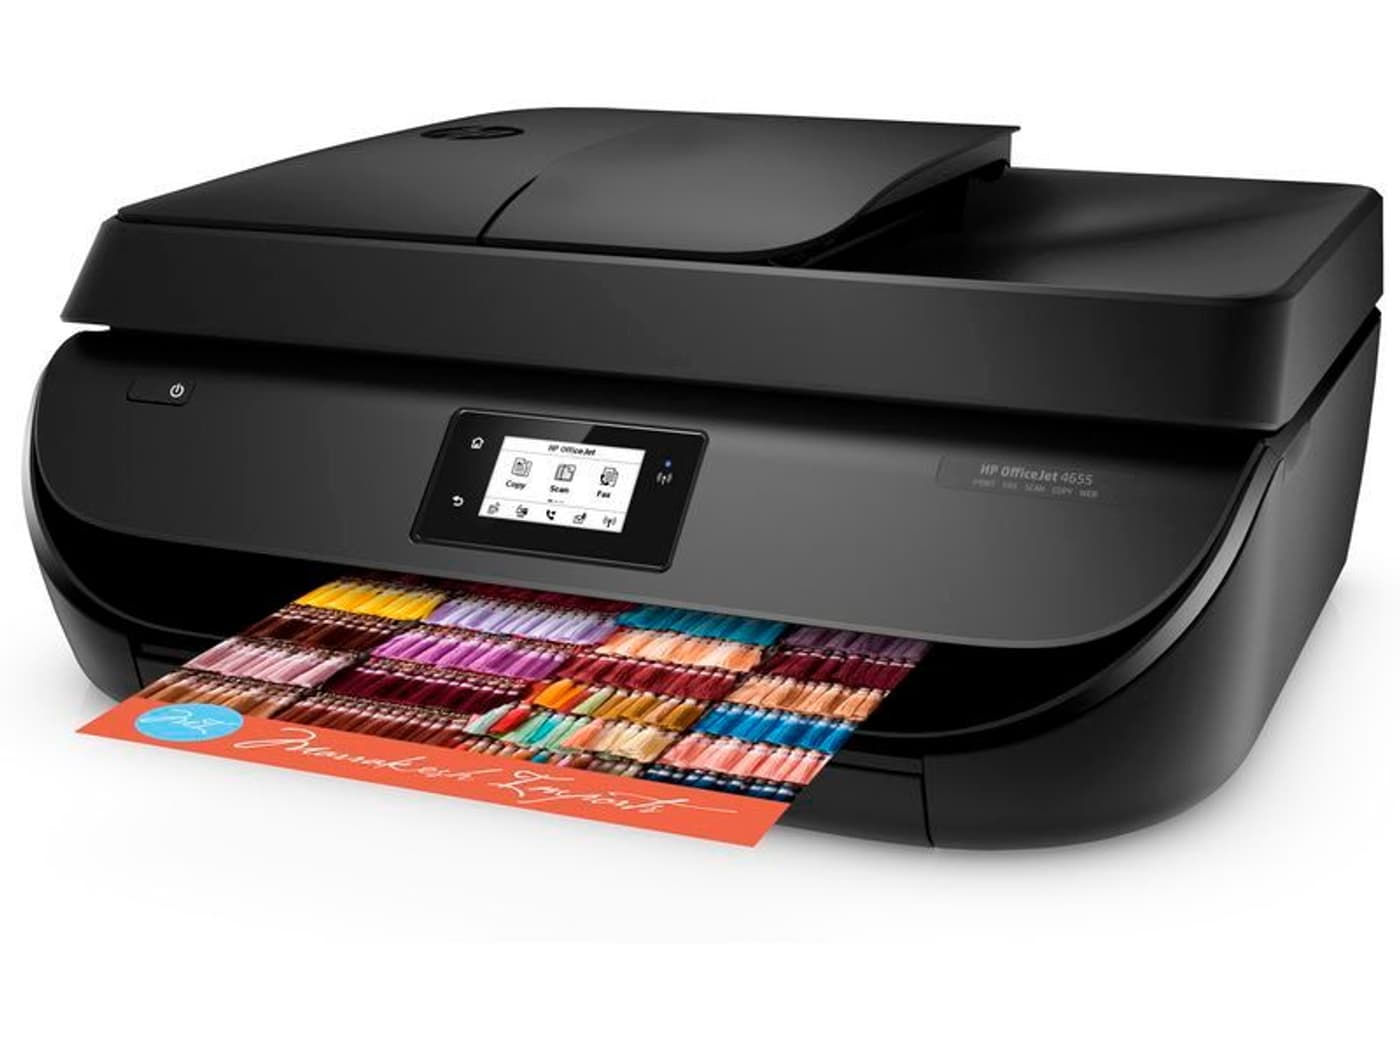 hp officejet 4656 aio drucker scanner kopierer fax. Black Bedroom Furniture Sets. Home Design Ideas